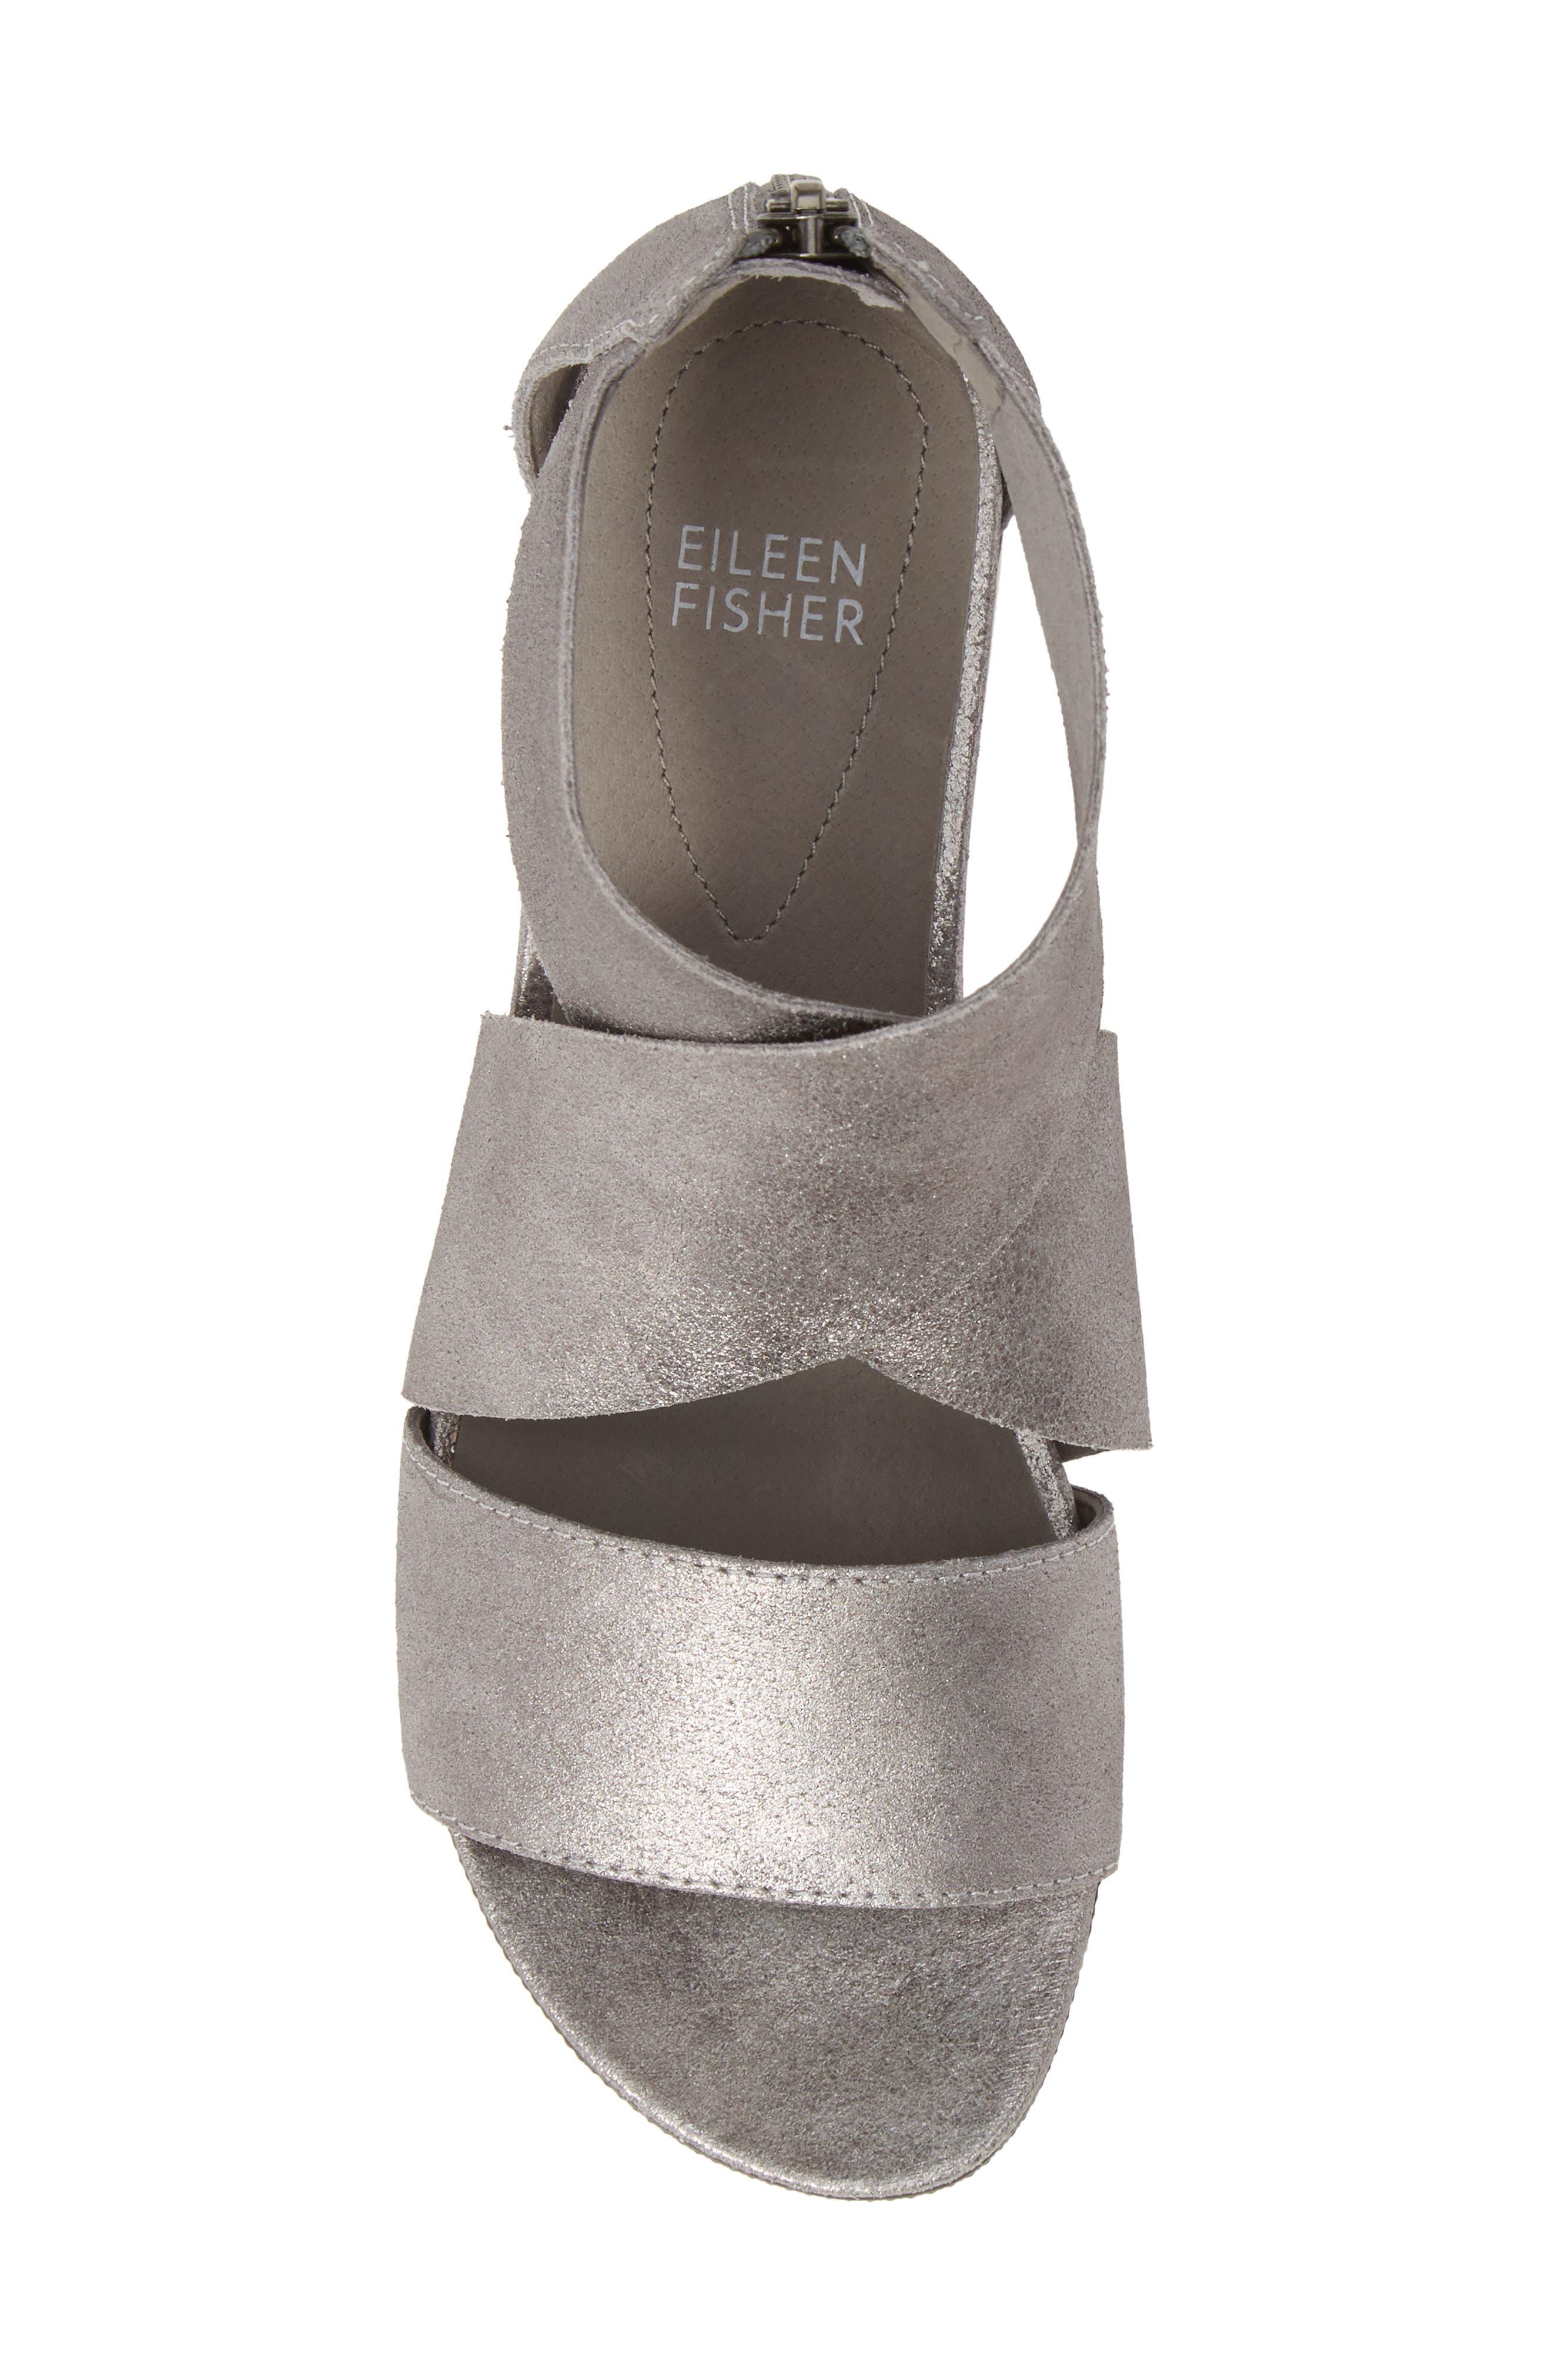 EILEEN FISHER,                             Sport Platform Sandal,                             Alternate thumbnail 5, color,                             SILVER METALLIC